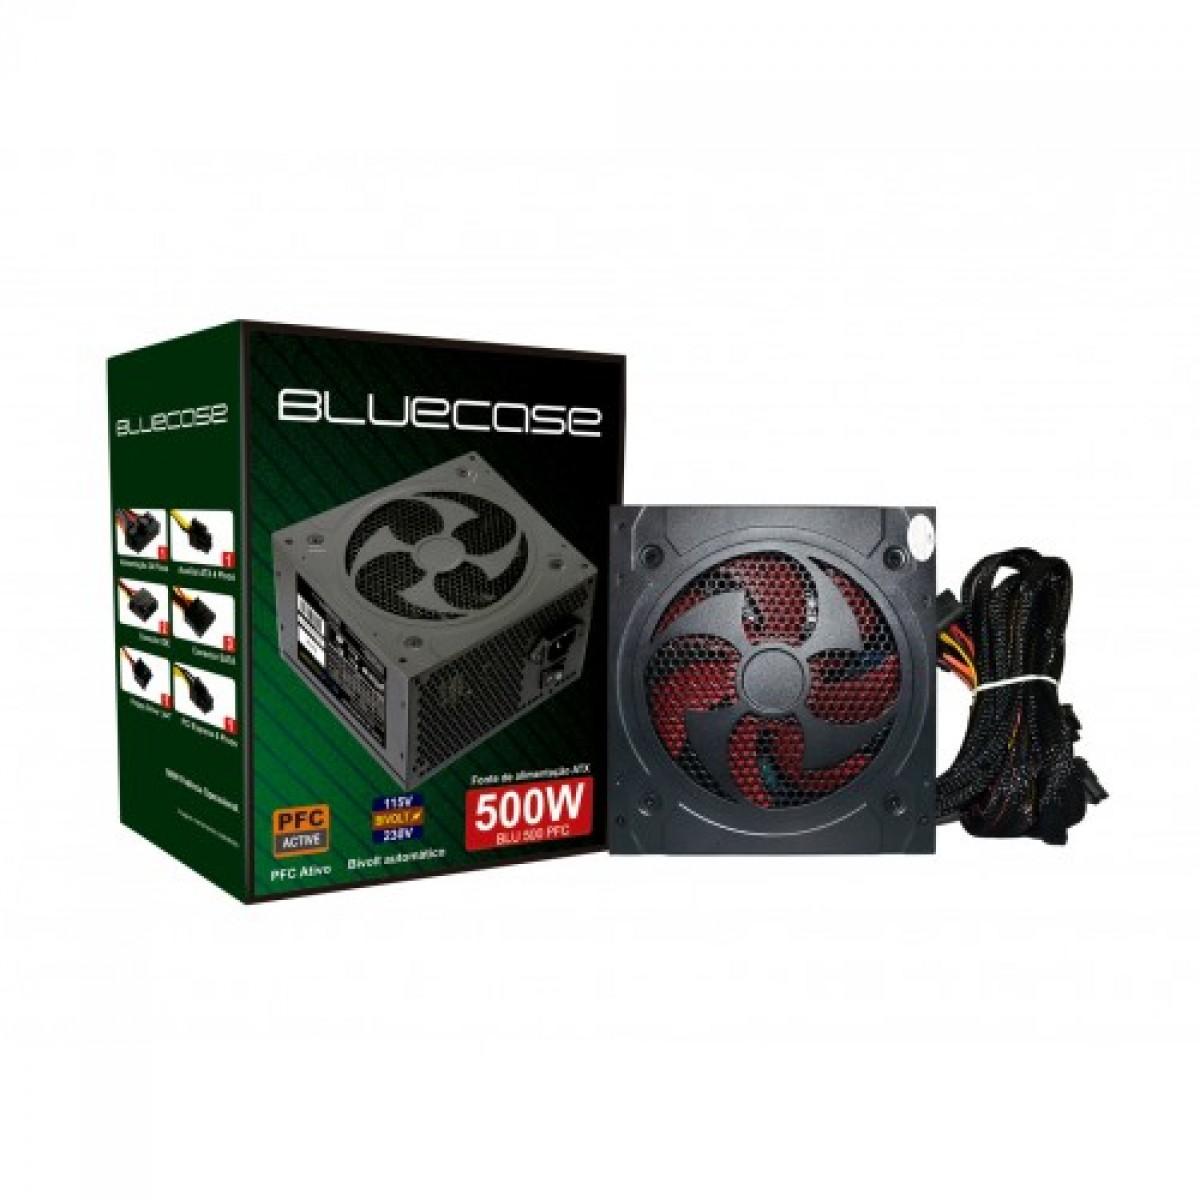 Fonte BlueCase 500W BLU500PFC,  PFC ATIVO, BOX C/CABO